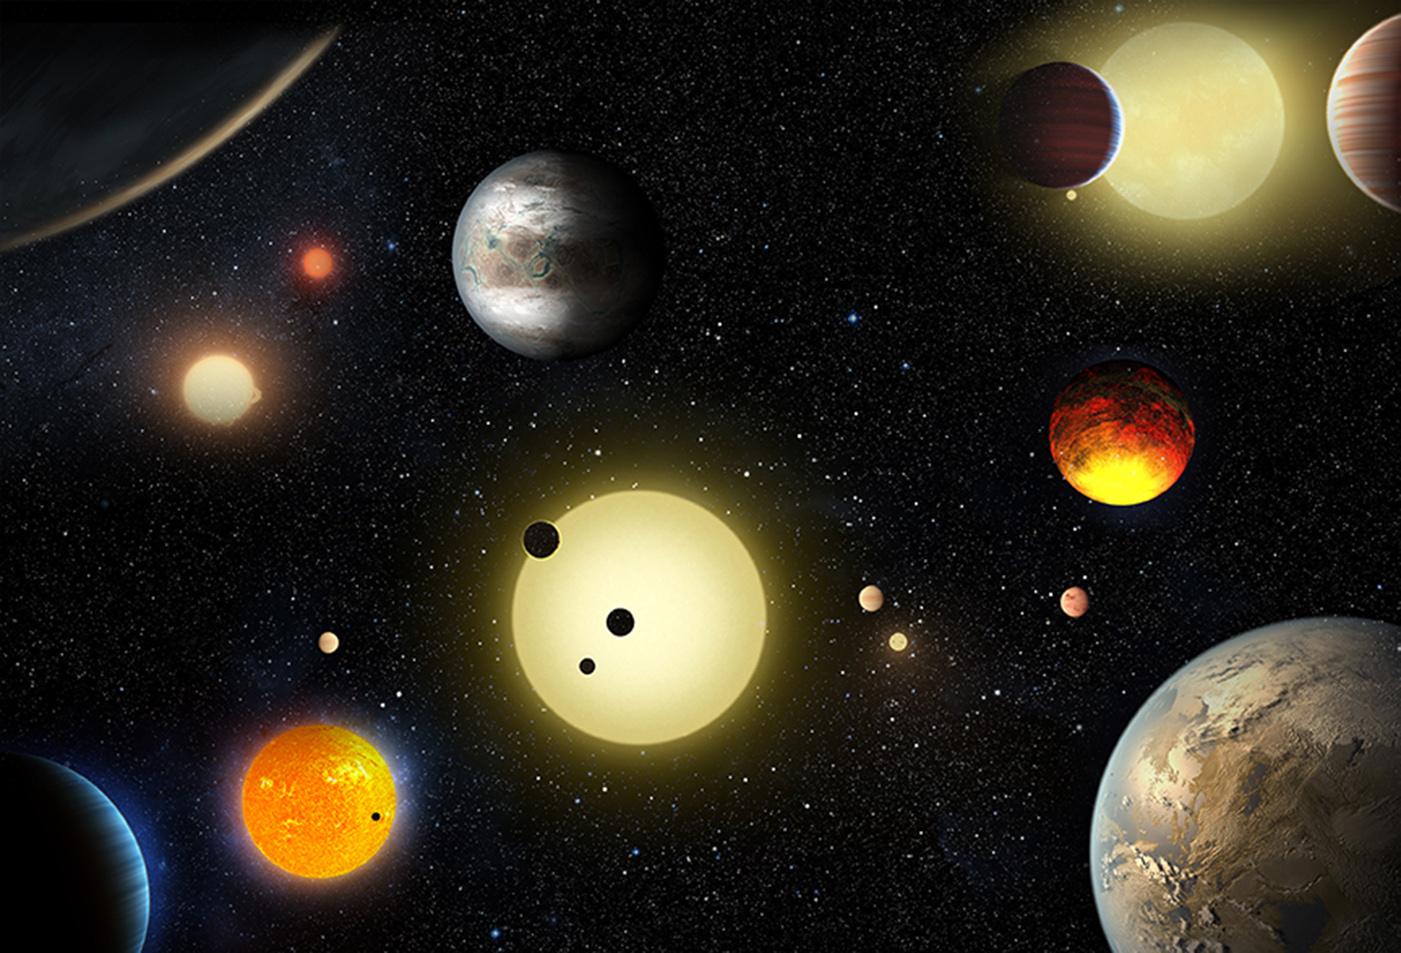 master_image_kepler_all-planets_may2016.